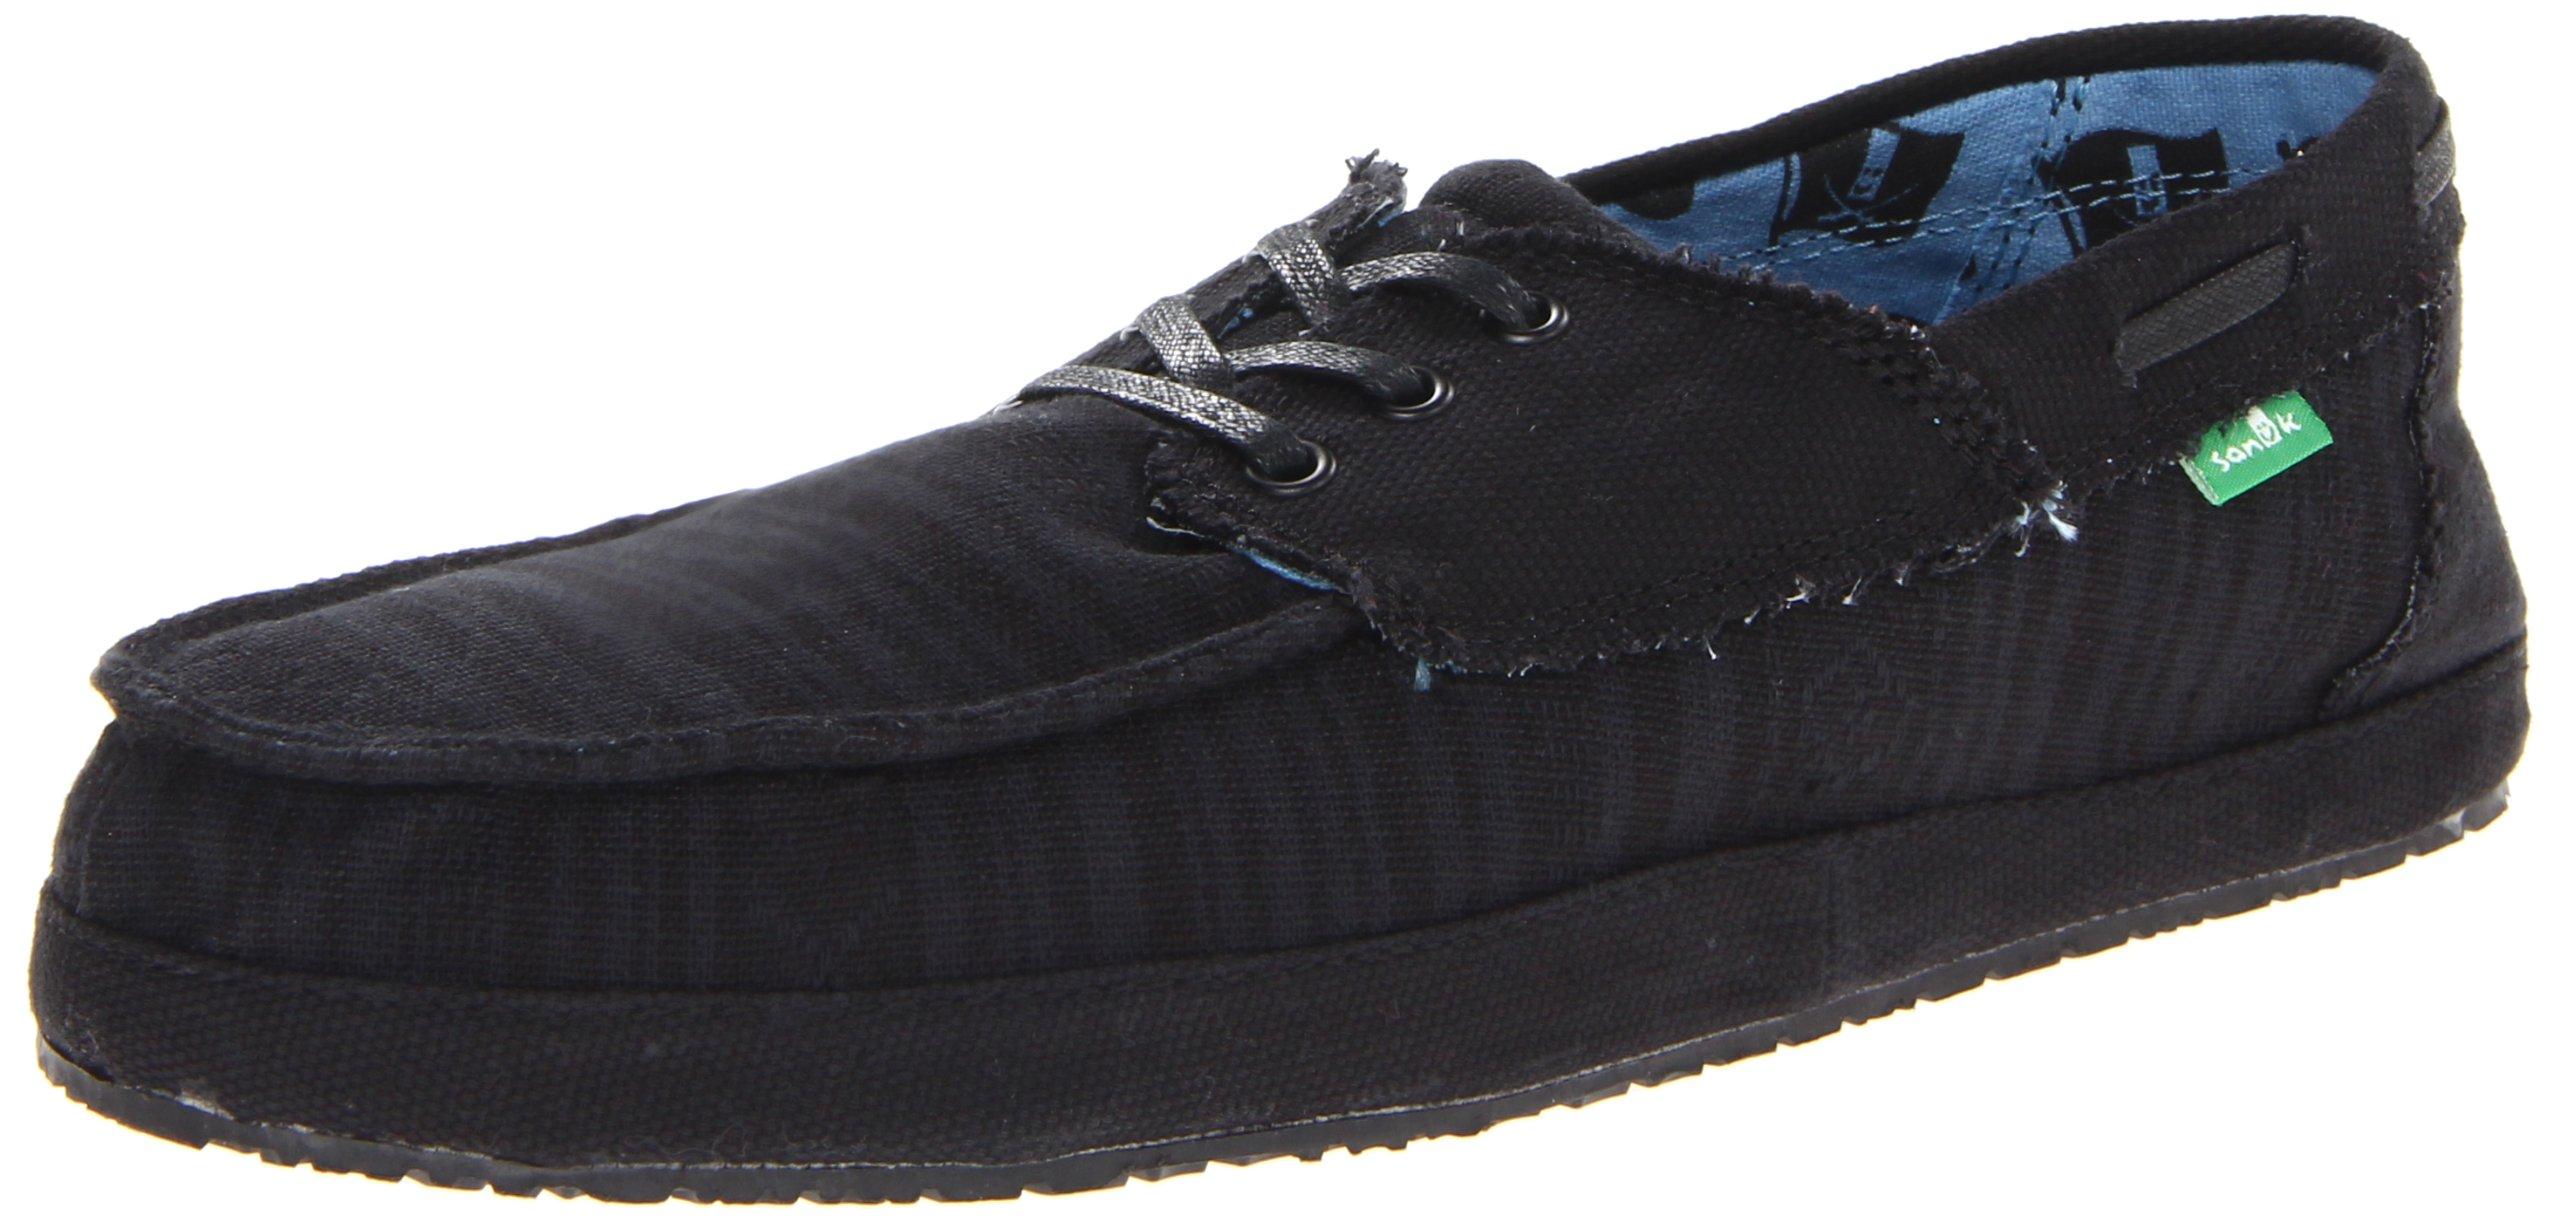 Sanuk Men's Docksteady SWS Boat Shoe,Black,12 M US